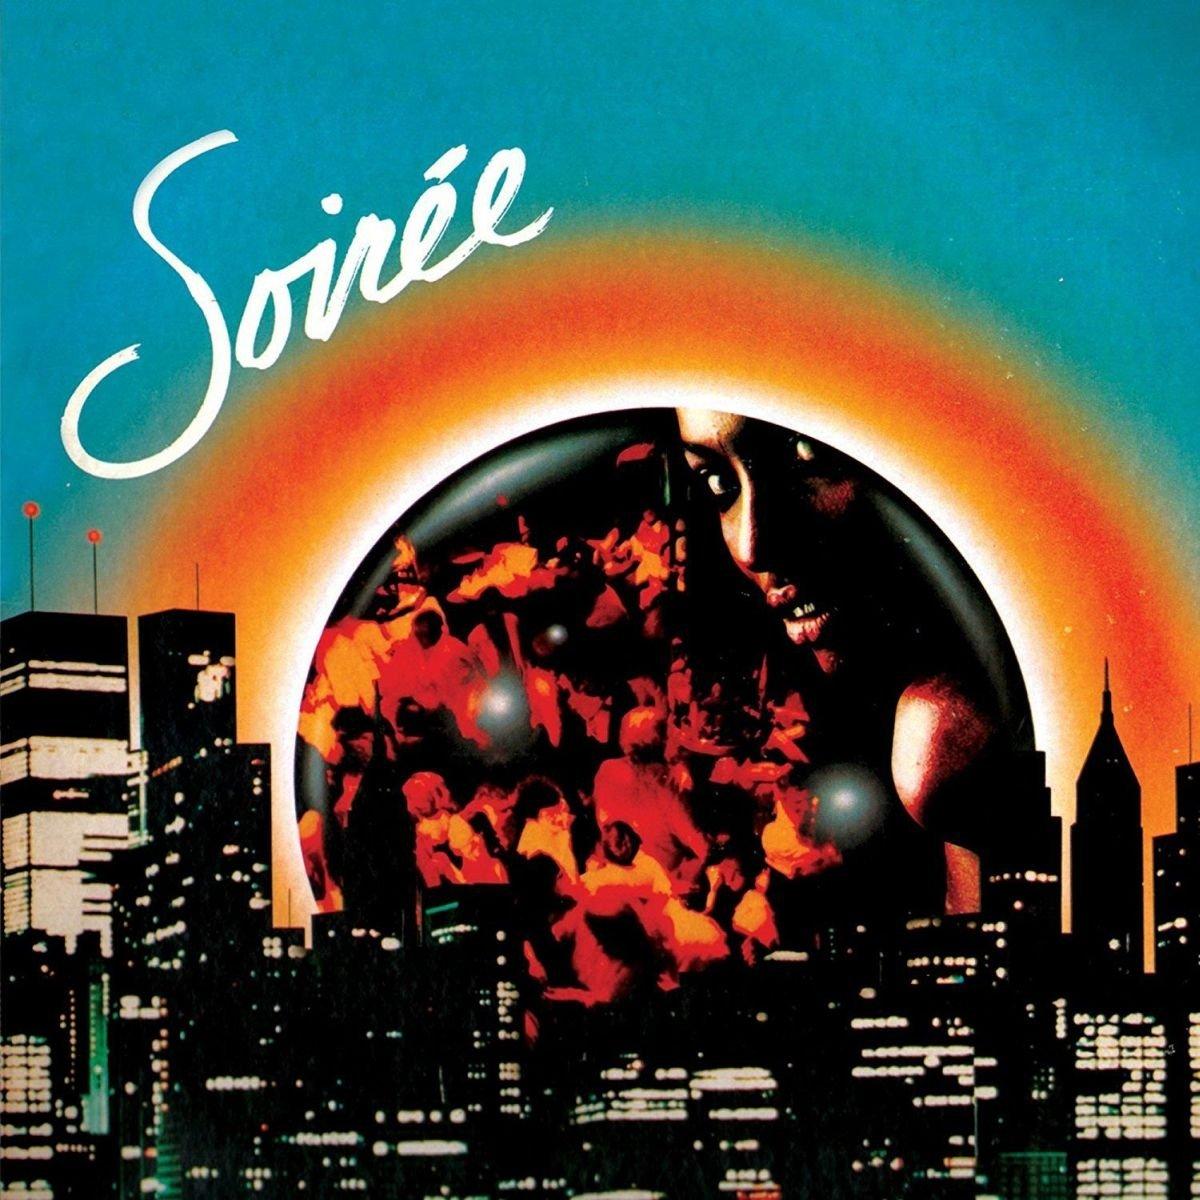 CD : Soirée - Soiree (CD)